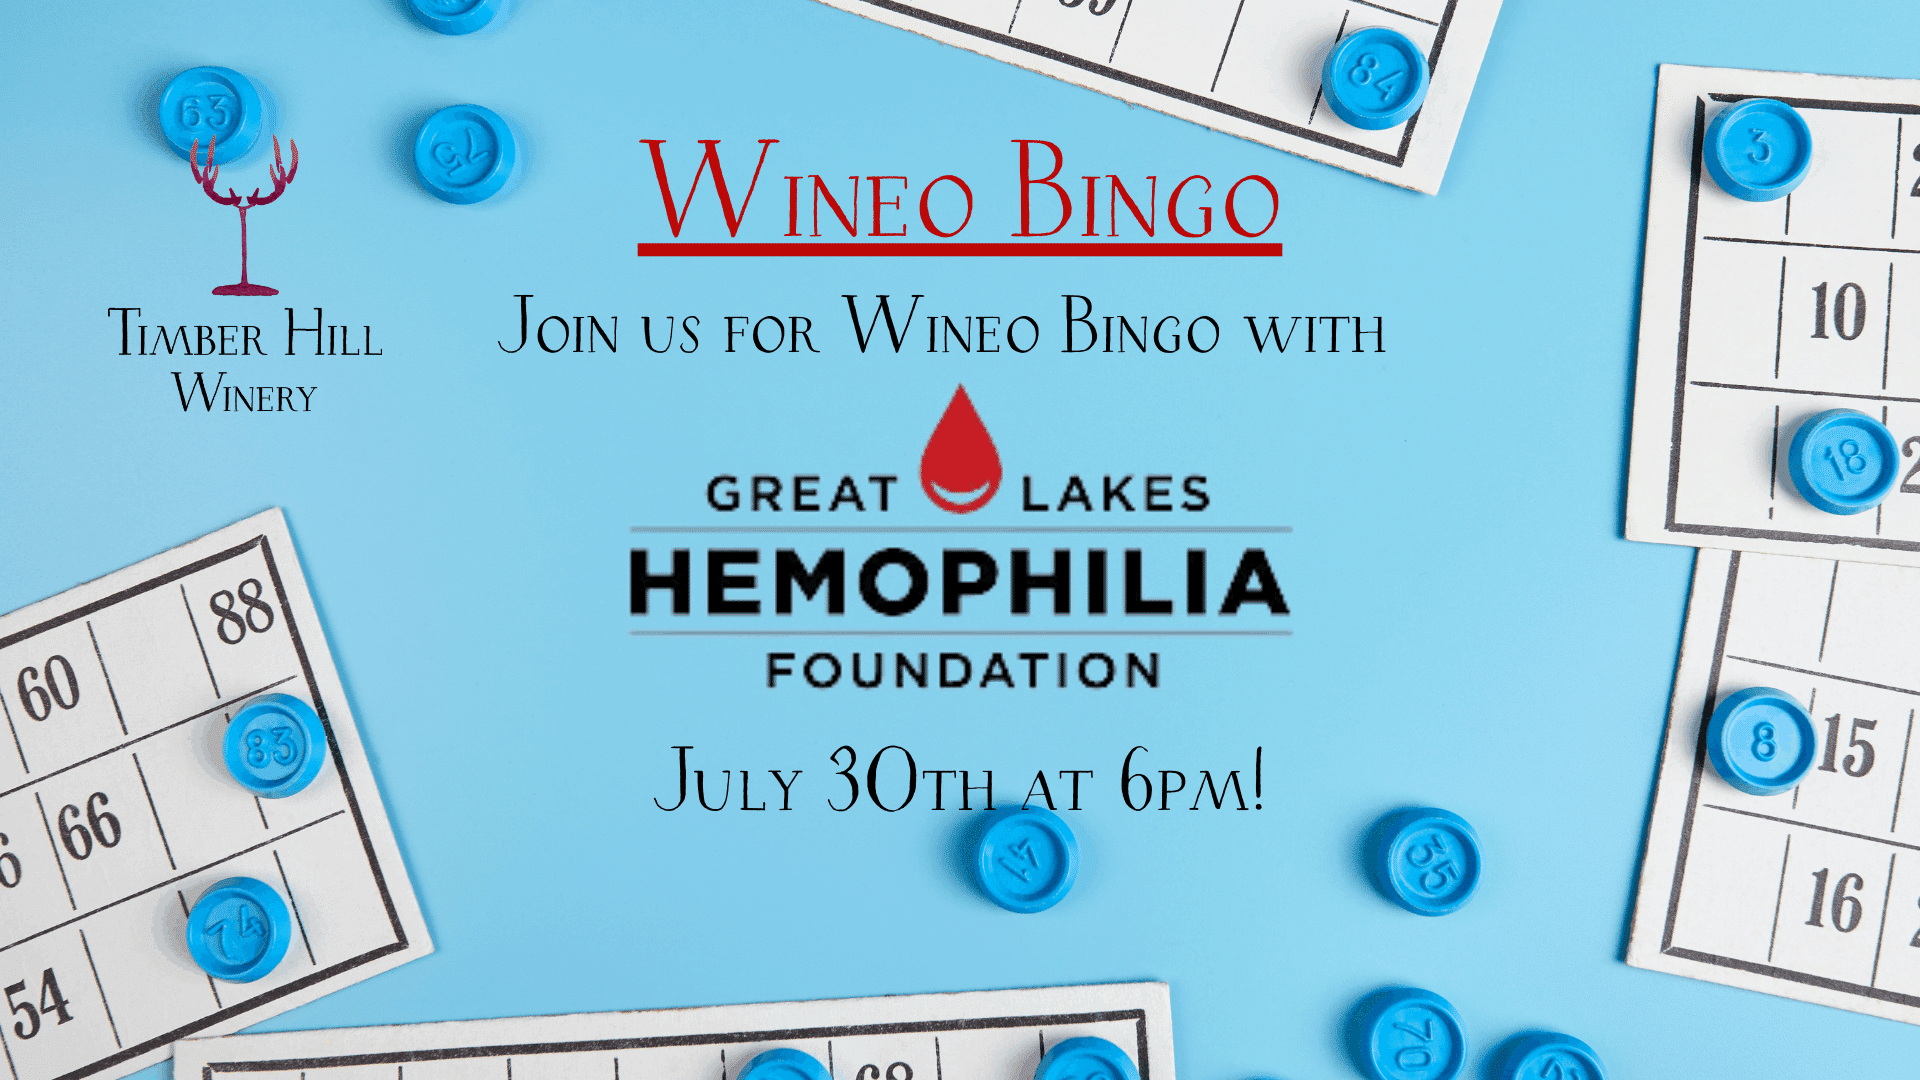 Wineo Bingo with the Great Lakes Hemophilia Foundation